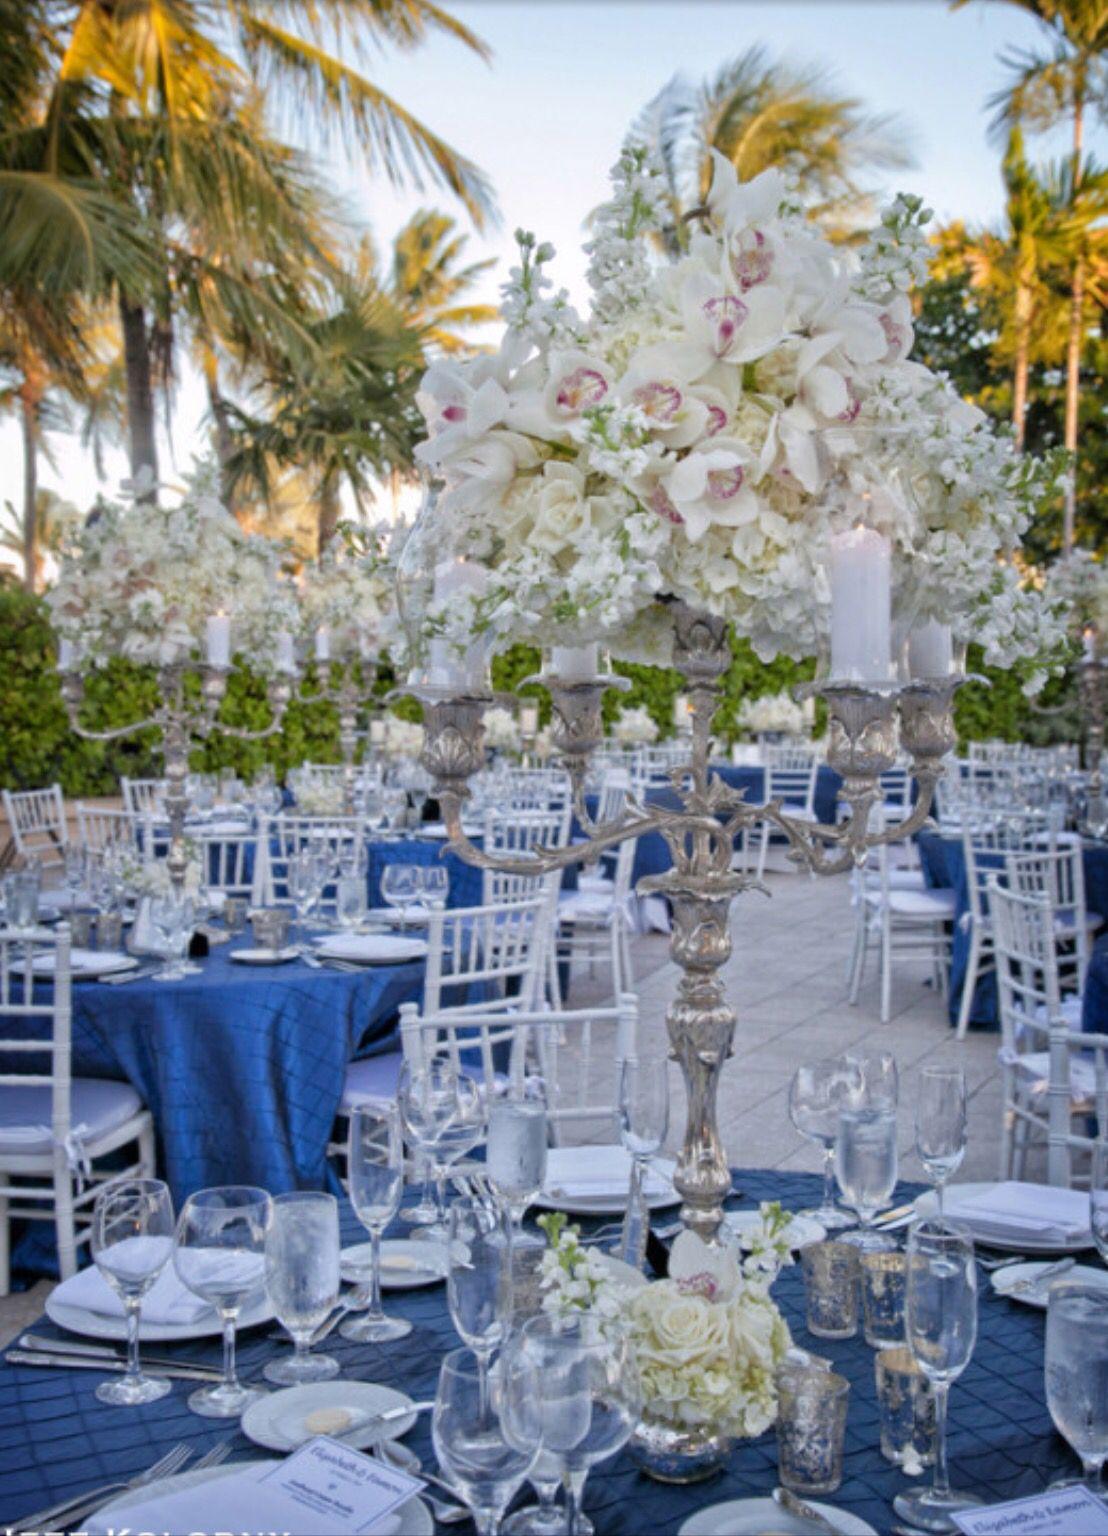 Blue linens | Reception Centerpieces | Pinterest | Reception and ...